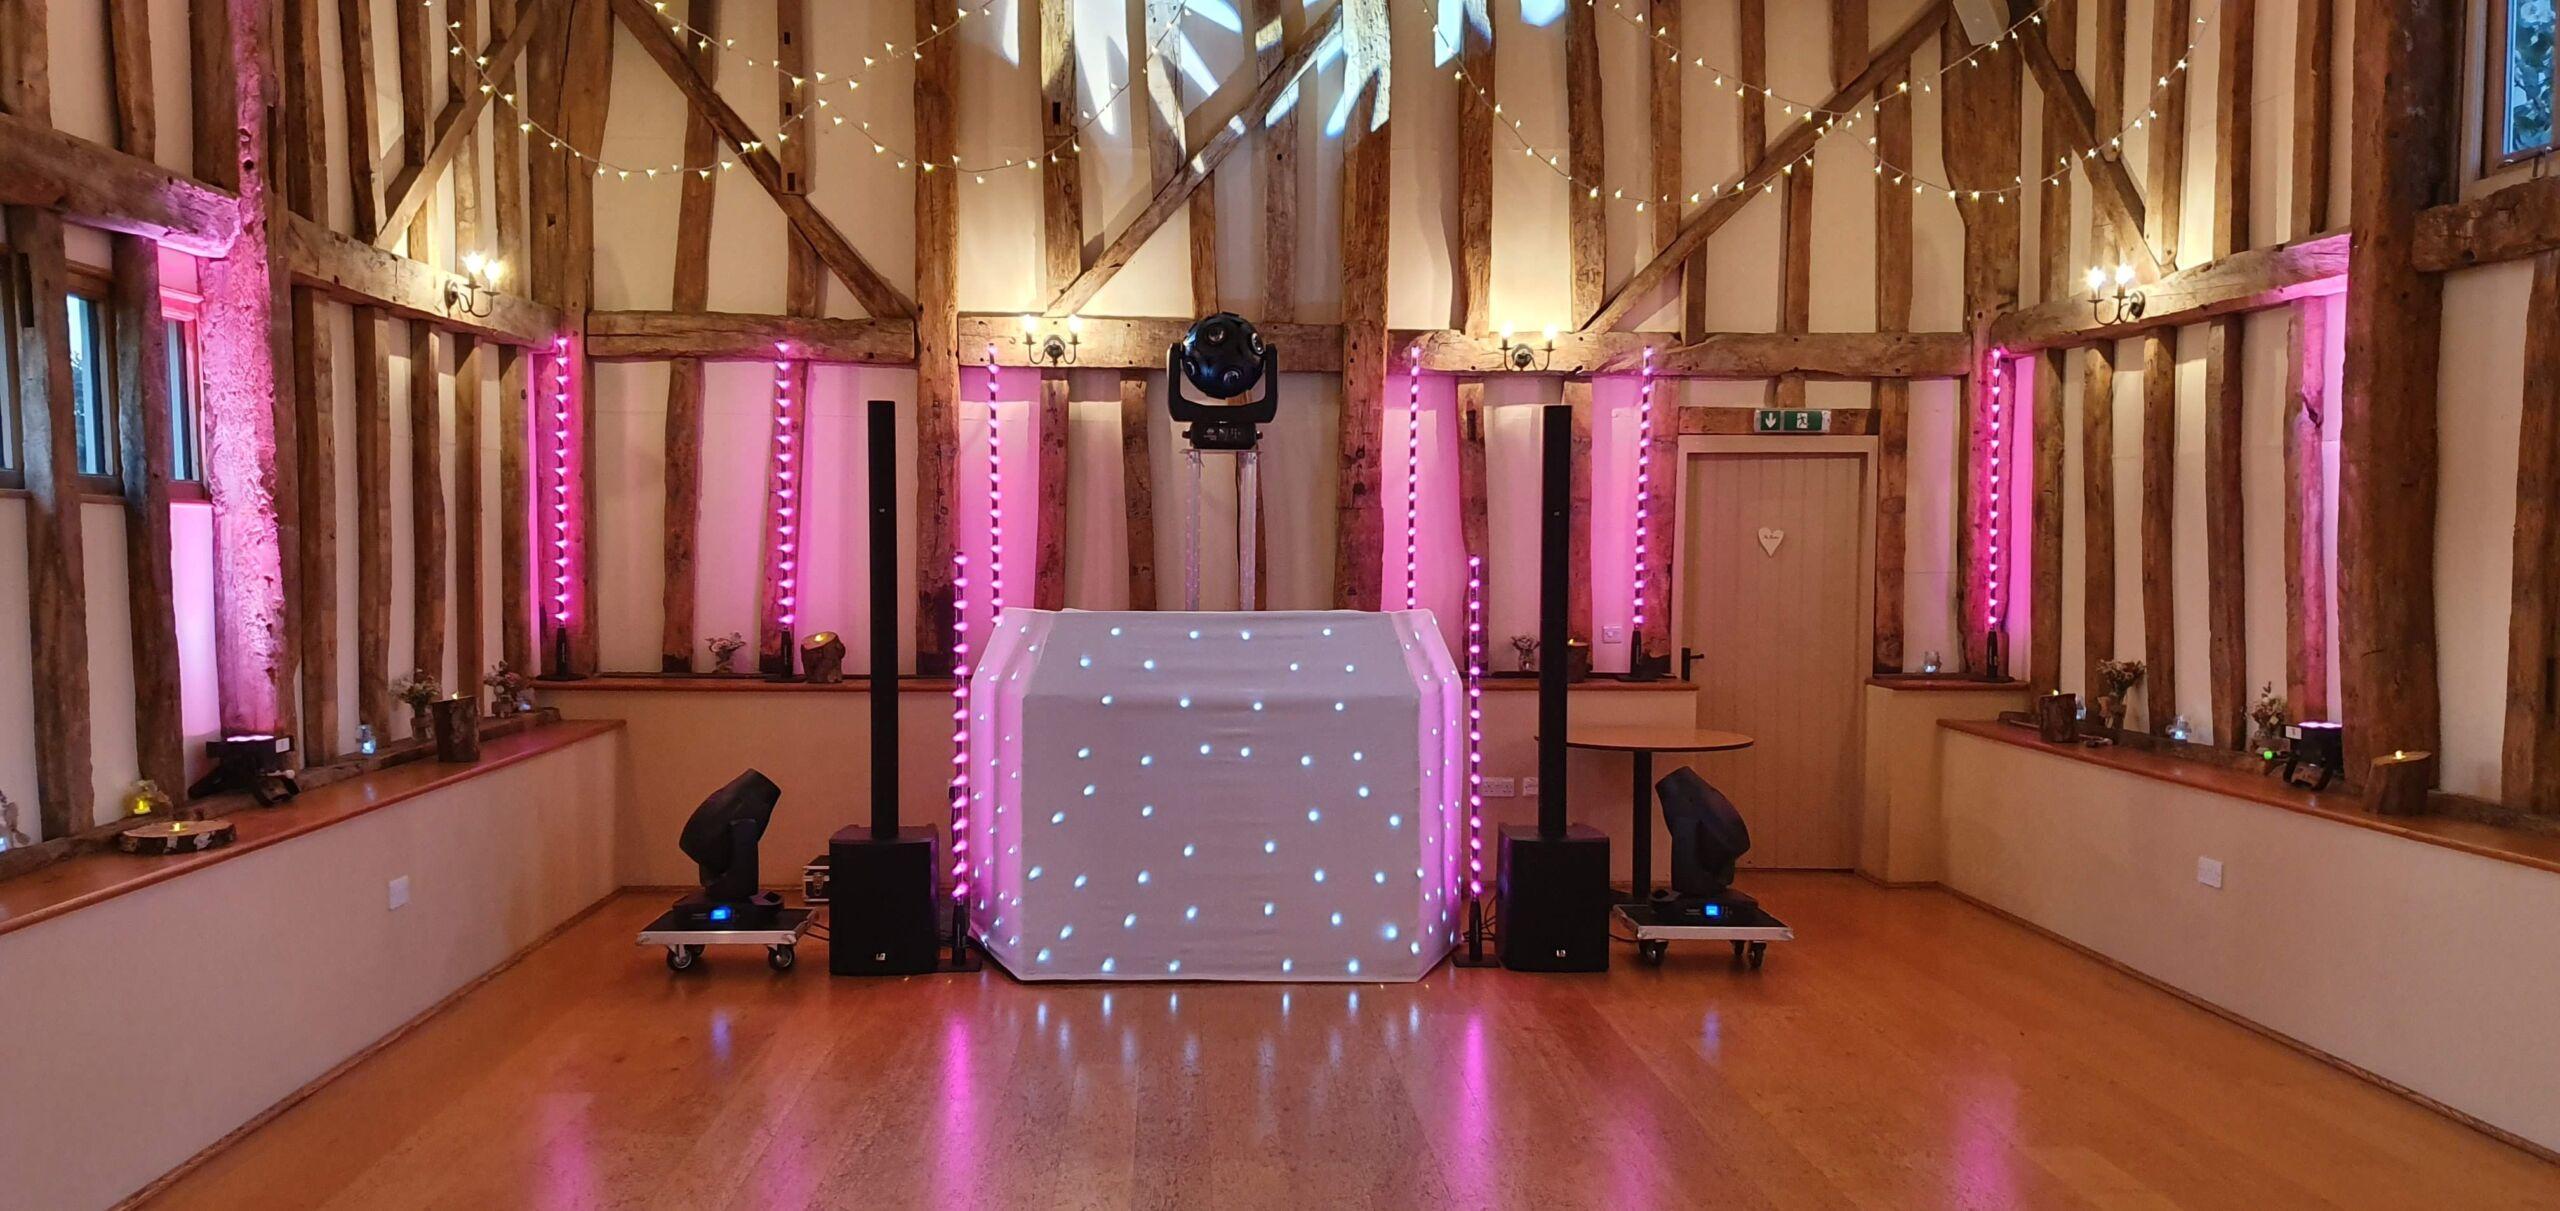 Garden Barn wedding disco with pink uplighting